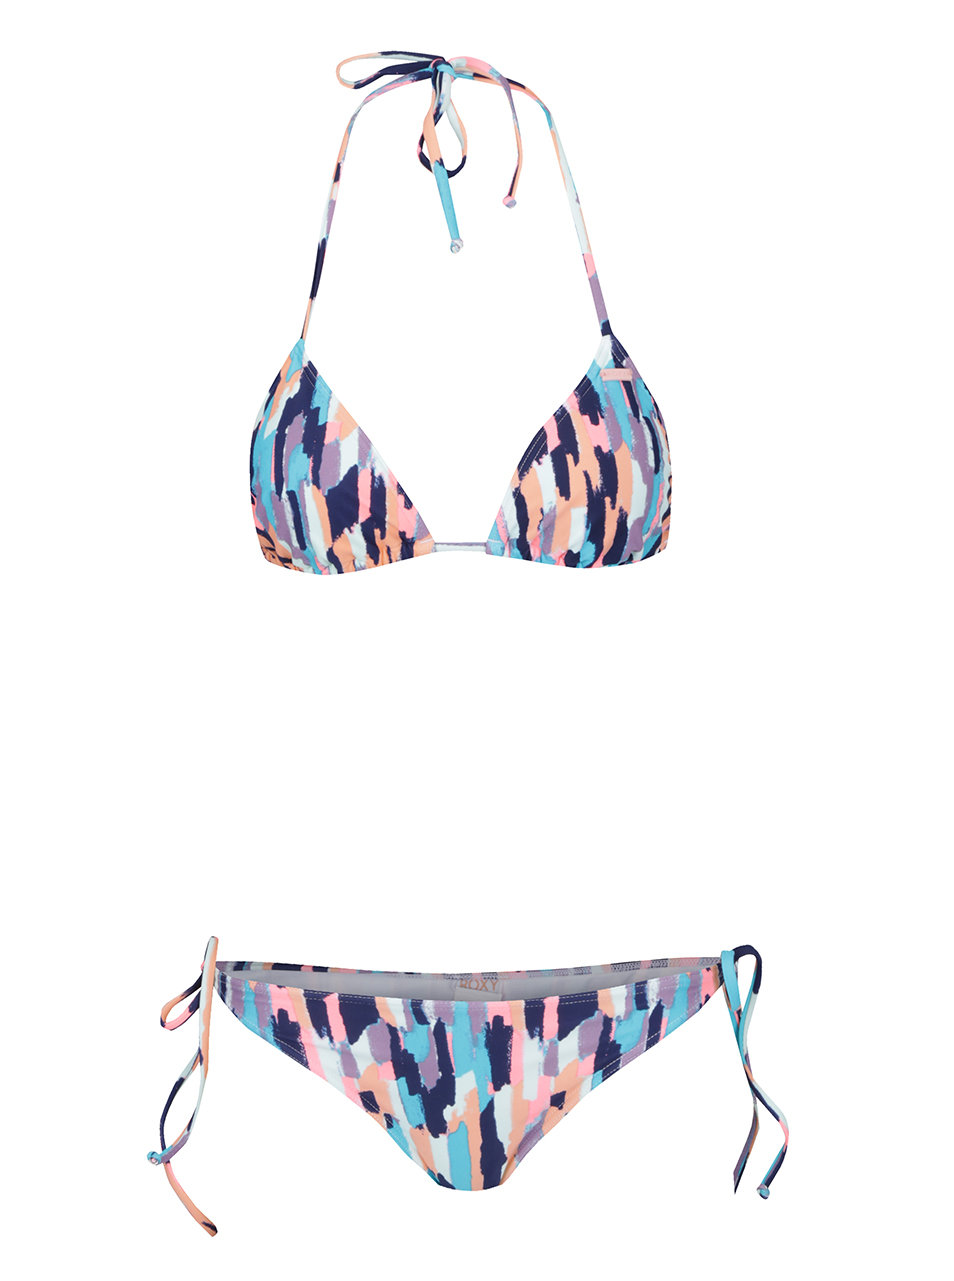 3a90a8a400c Modré dámské dvoudílné vzorované plavky Roxy Sporty ...